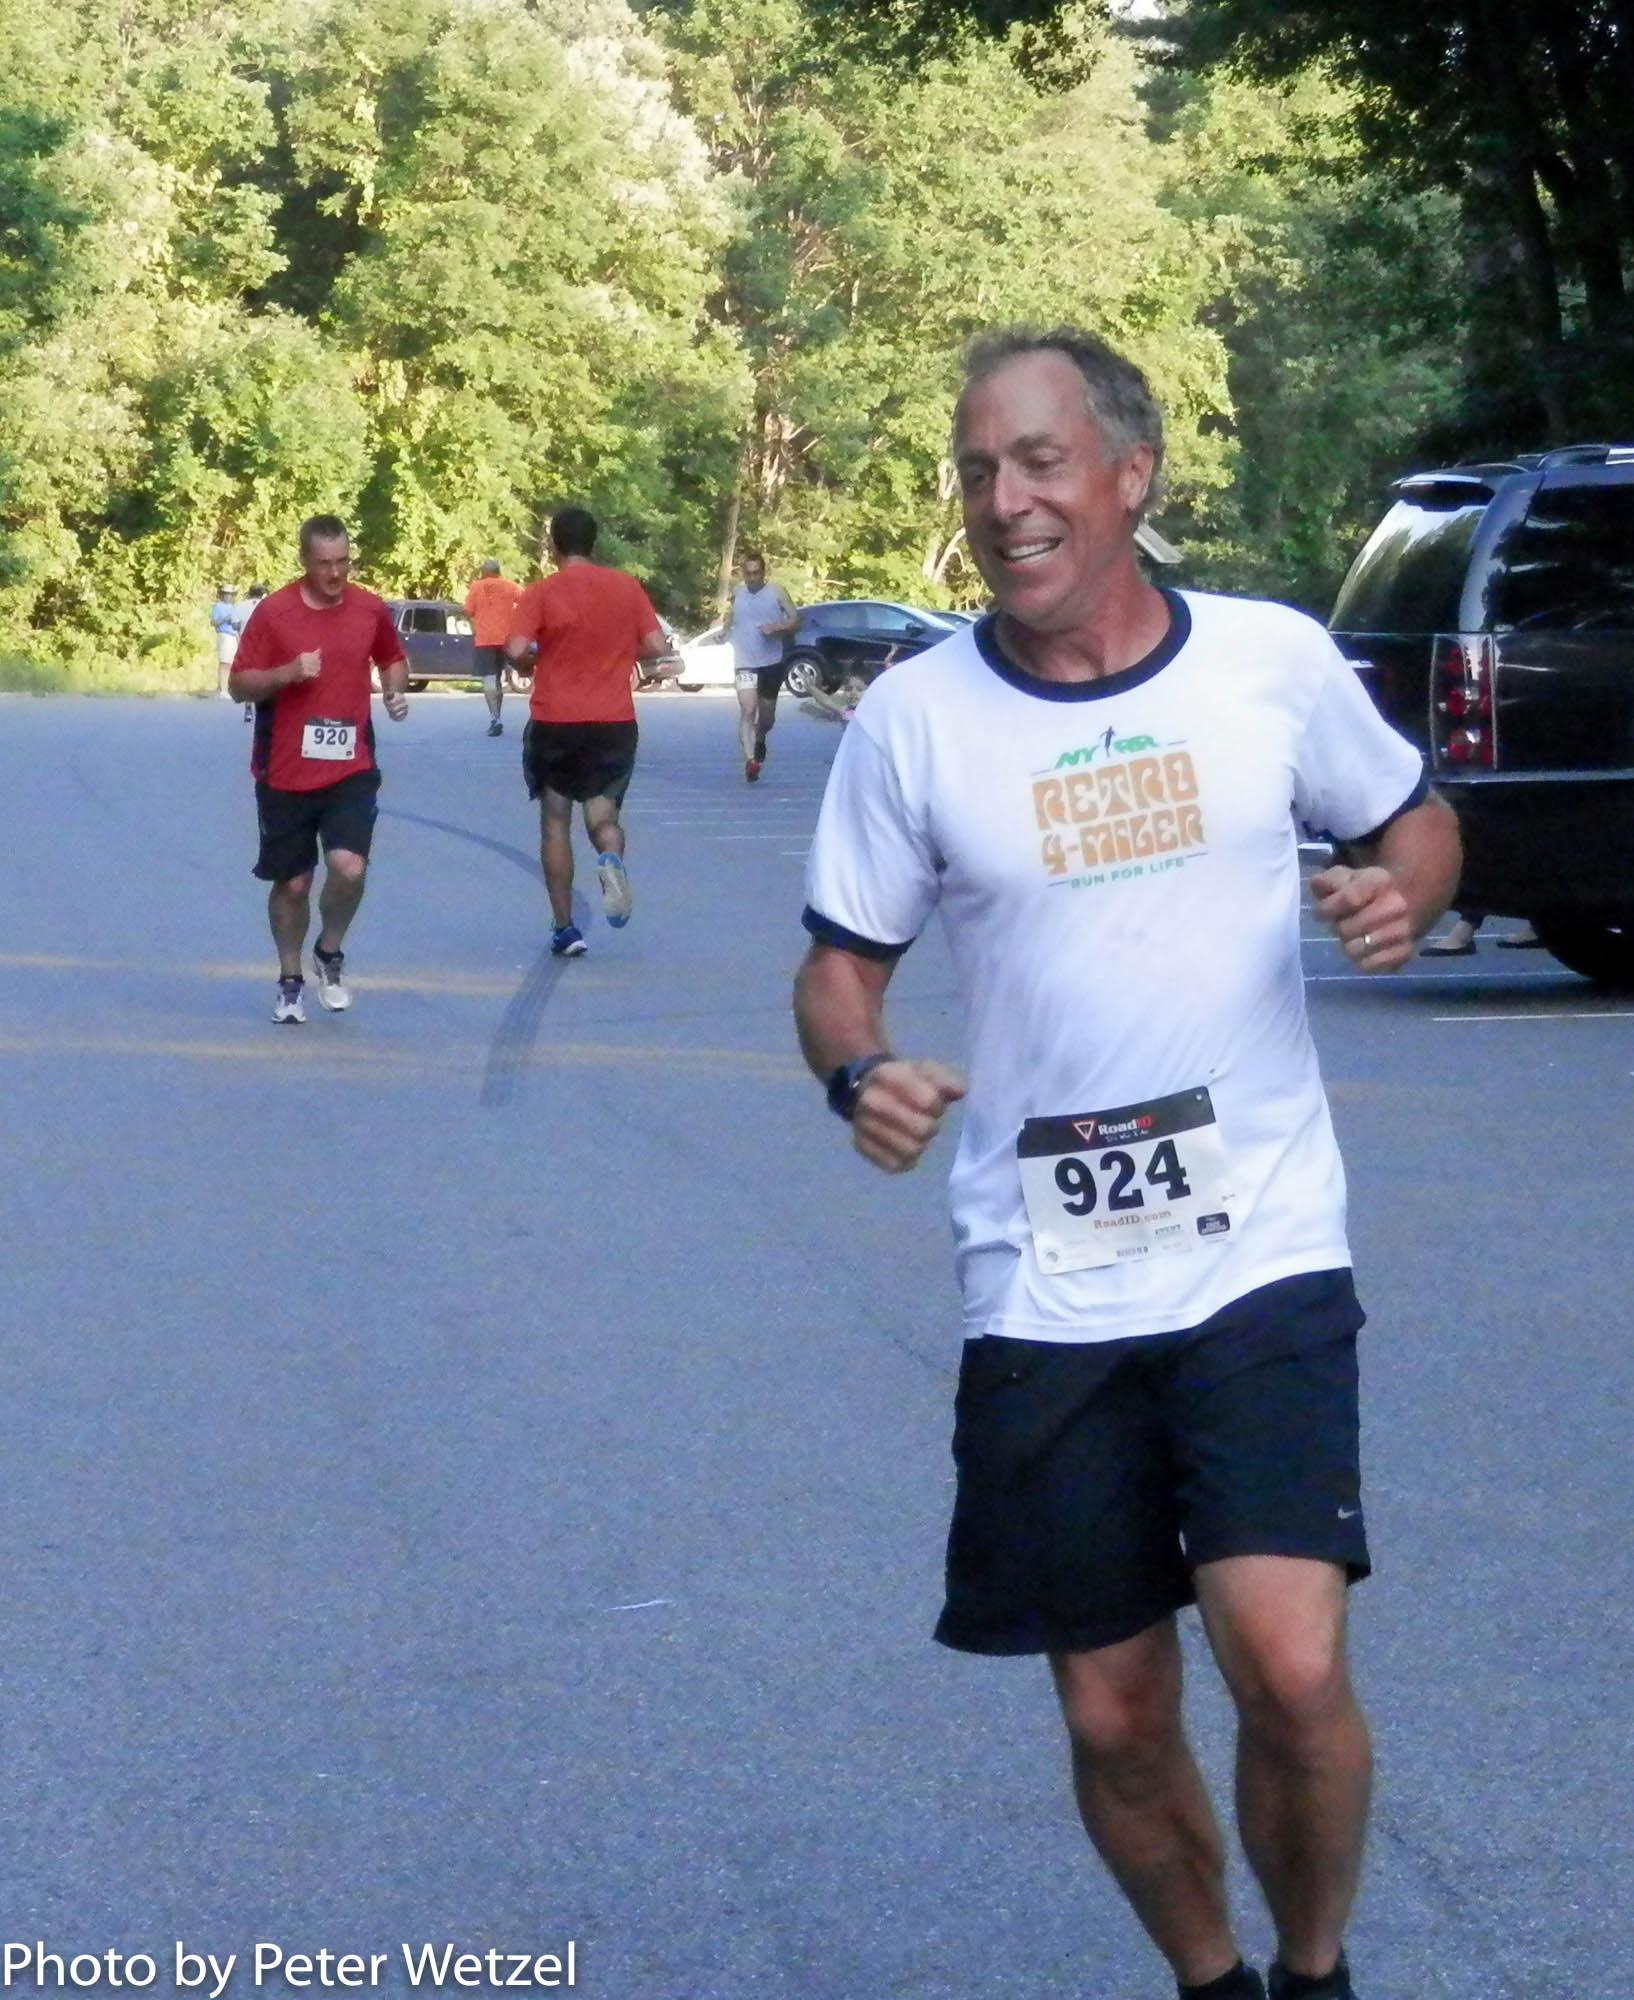 908 - 008 - Putnam County Classic 2016 Taconic Road Runners - Peter Wetzel - P7130043